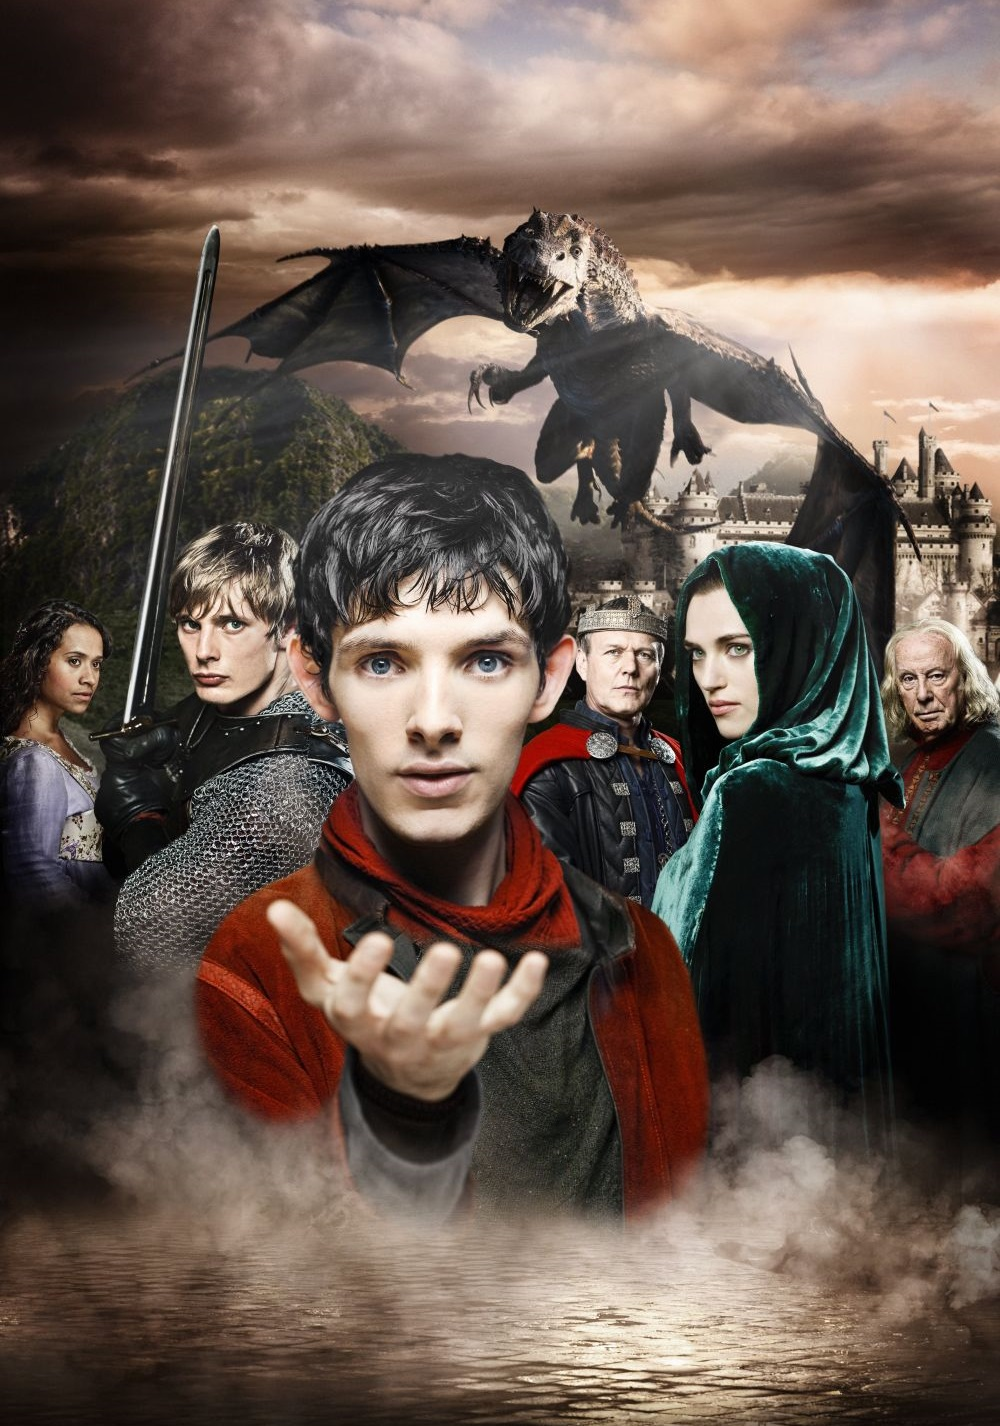 Merlin season 1 episode 7 2008 - Merlin 2008 Tv Poster Image